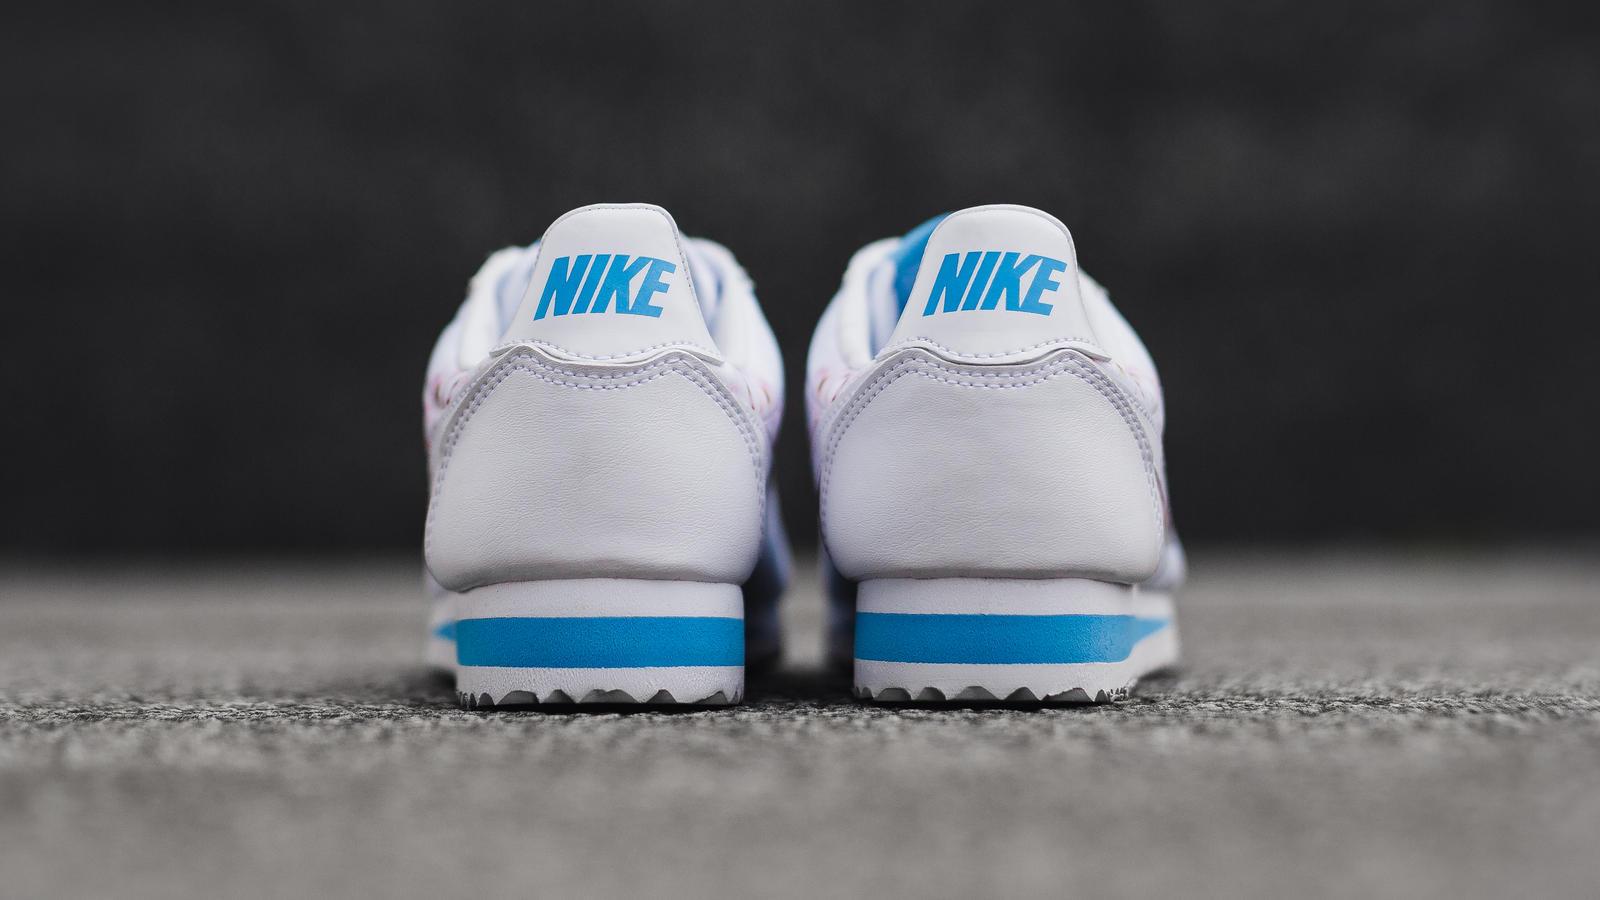 Nike Classic Cortez Cherry Blossom